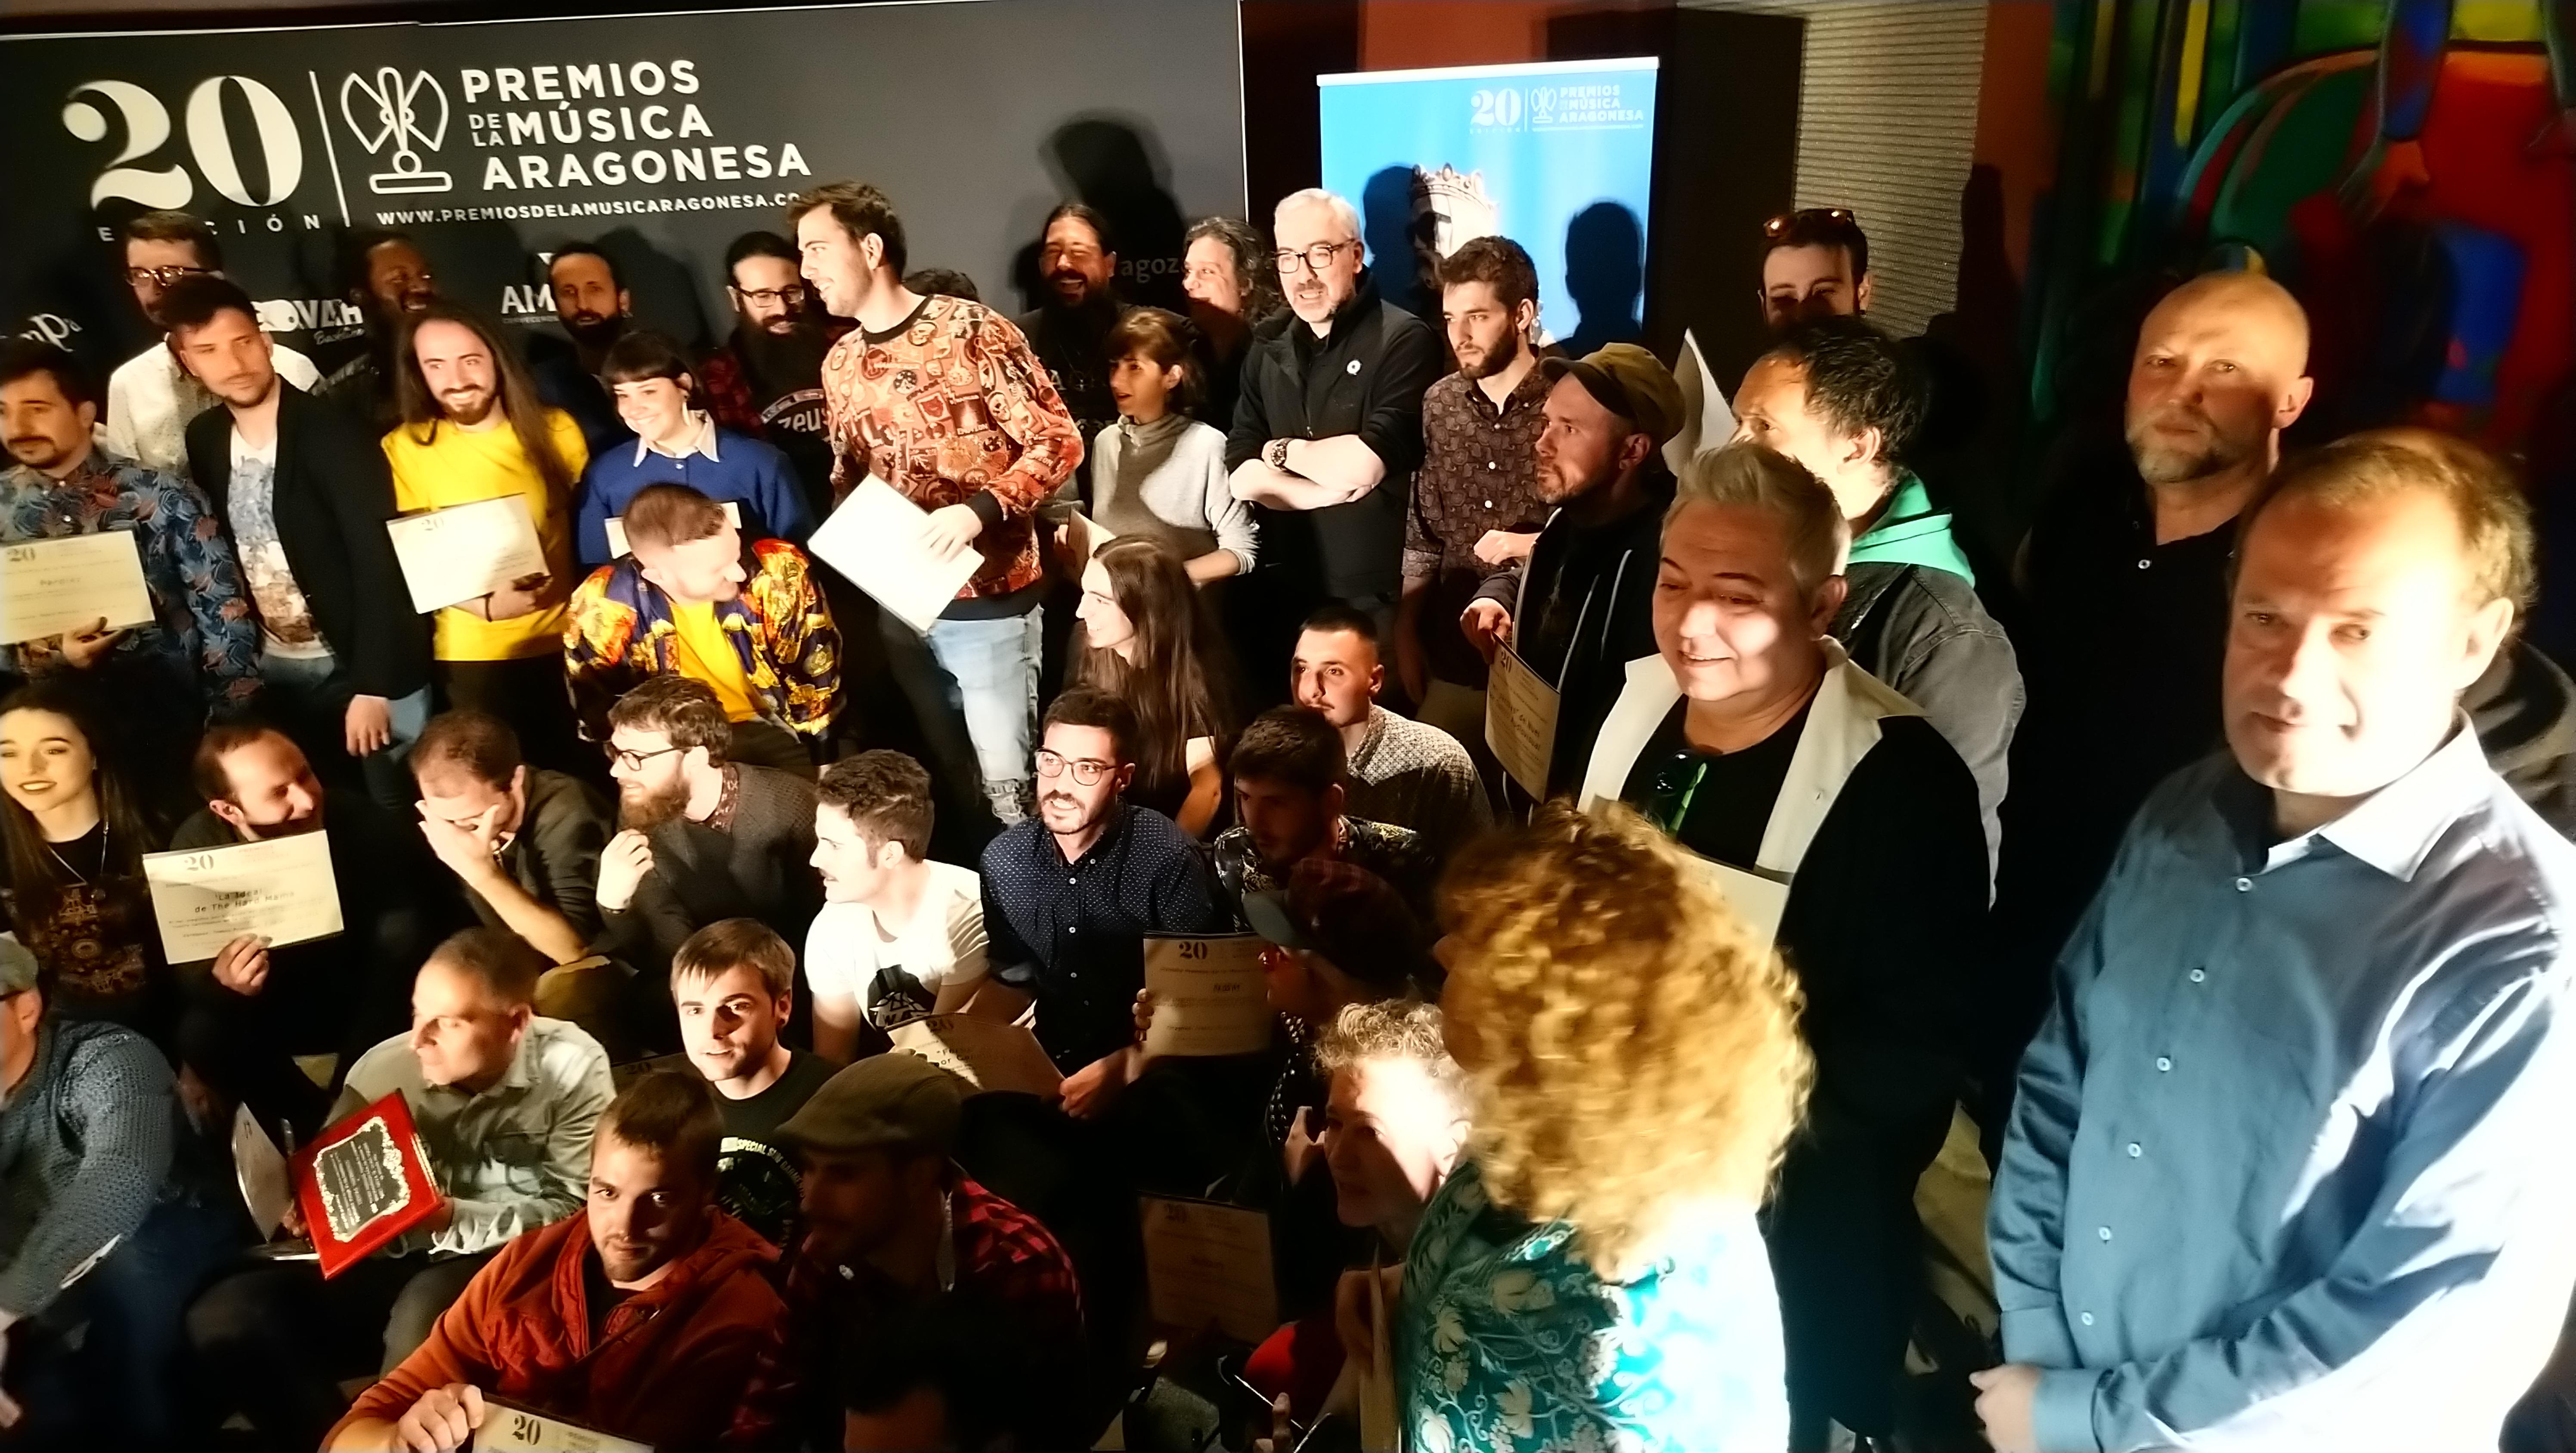 XX Premios de la Música Aragonesa. Foto de Familia.